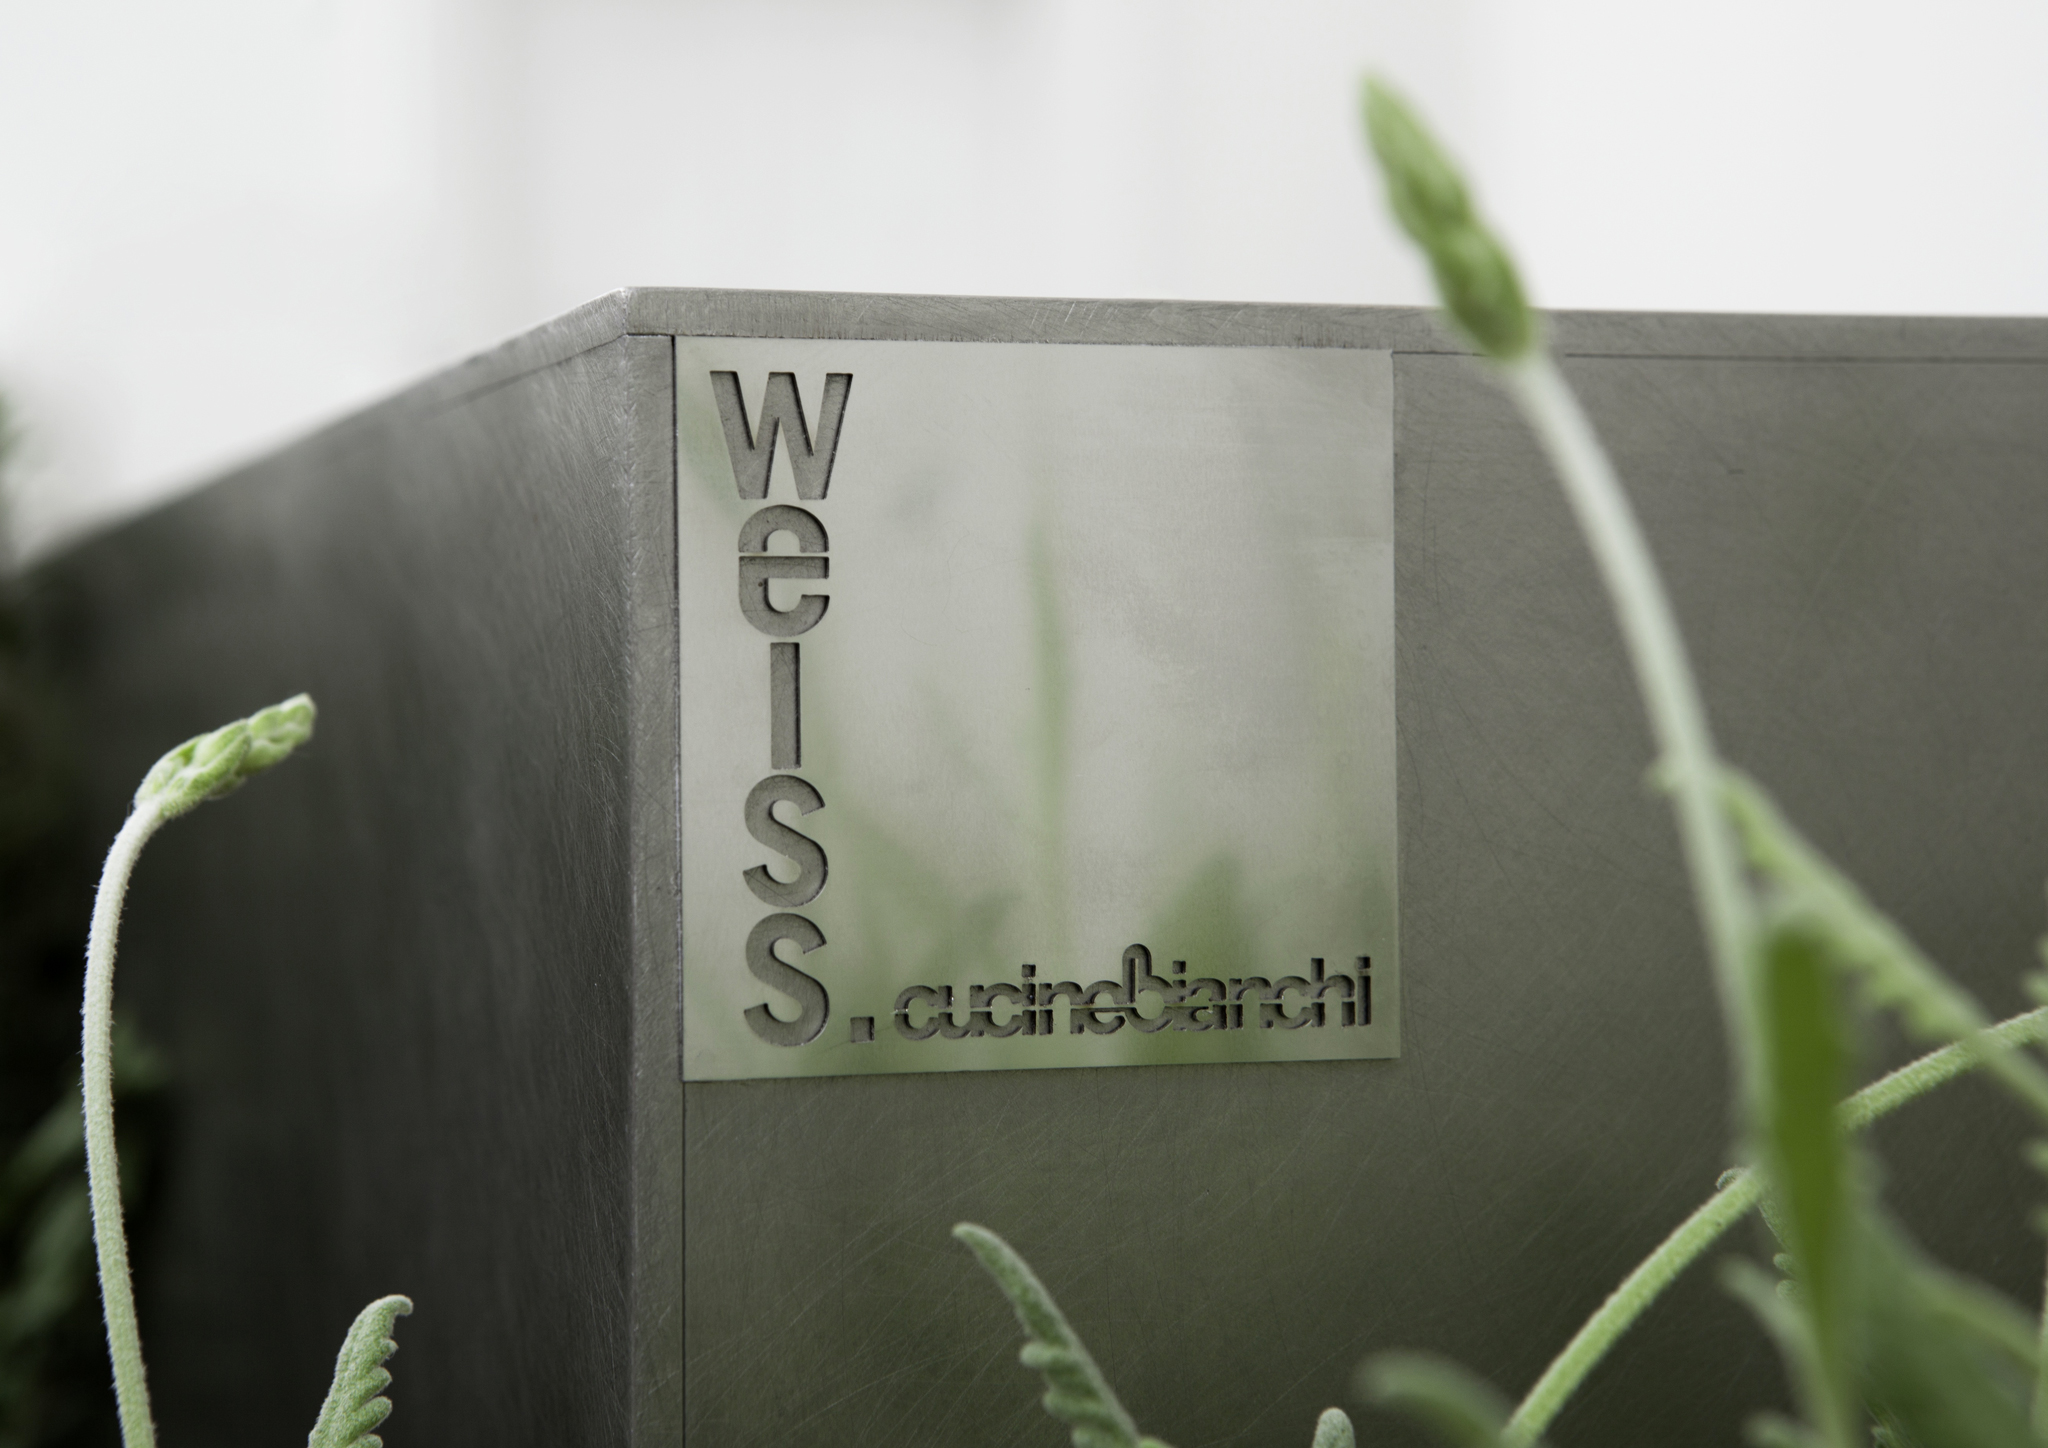 weiss cucinebianchi 2013